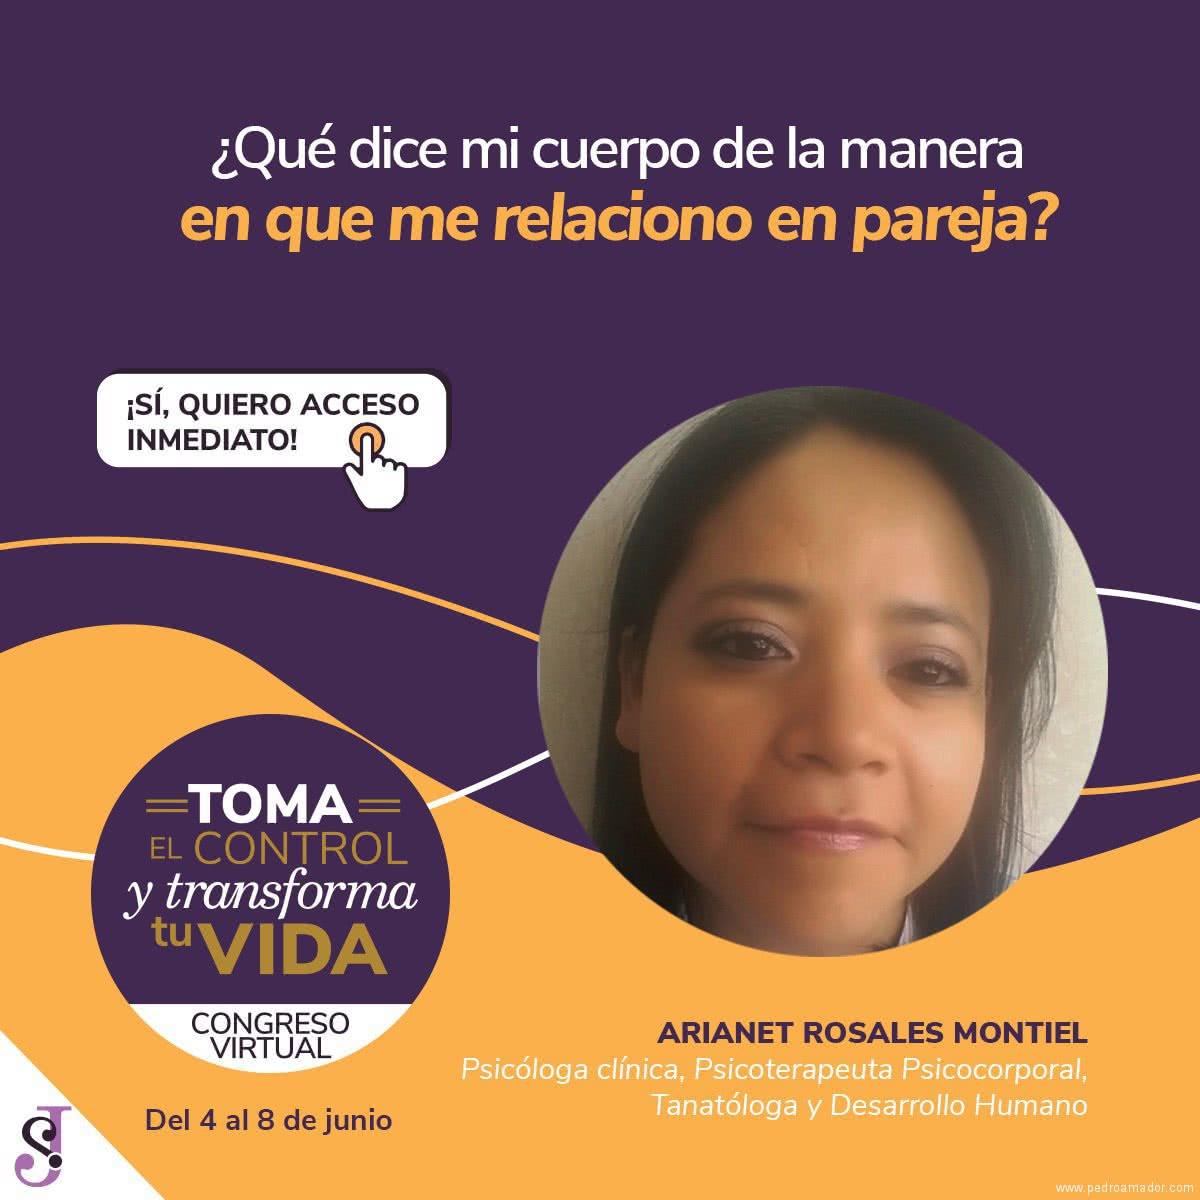 Transforma tu vida - Ariet Rosales Montiel